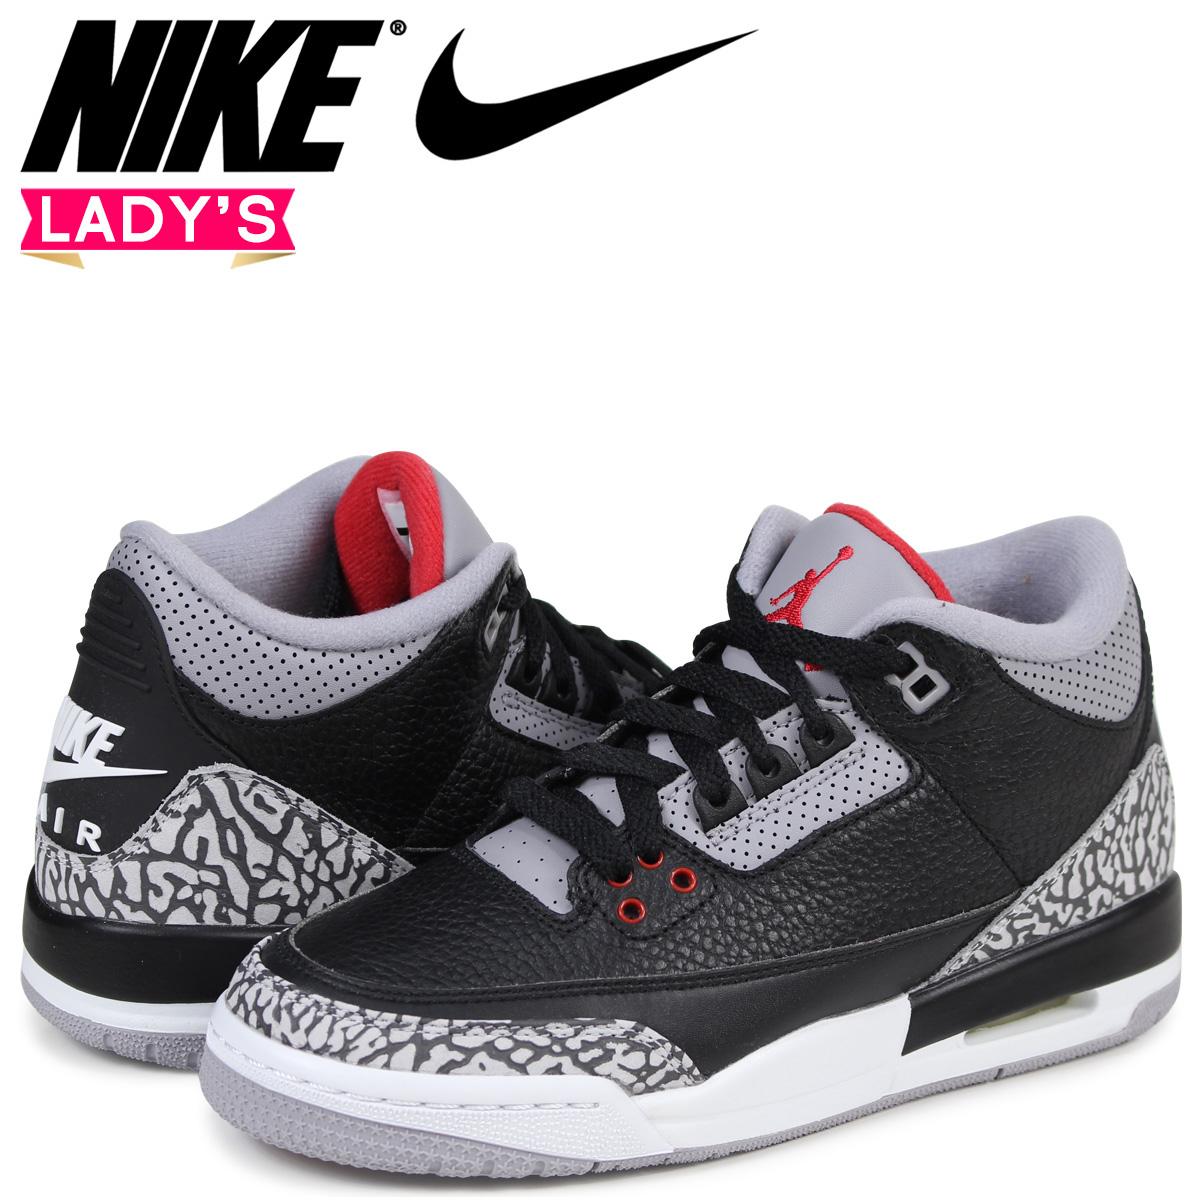 new style 3bd40 1d0b8 NIKE AIR JORDAN 3 RETRO OG BG Nike Air Jordan 3 nostalgic lady's sneakers  854,261-001 black